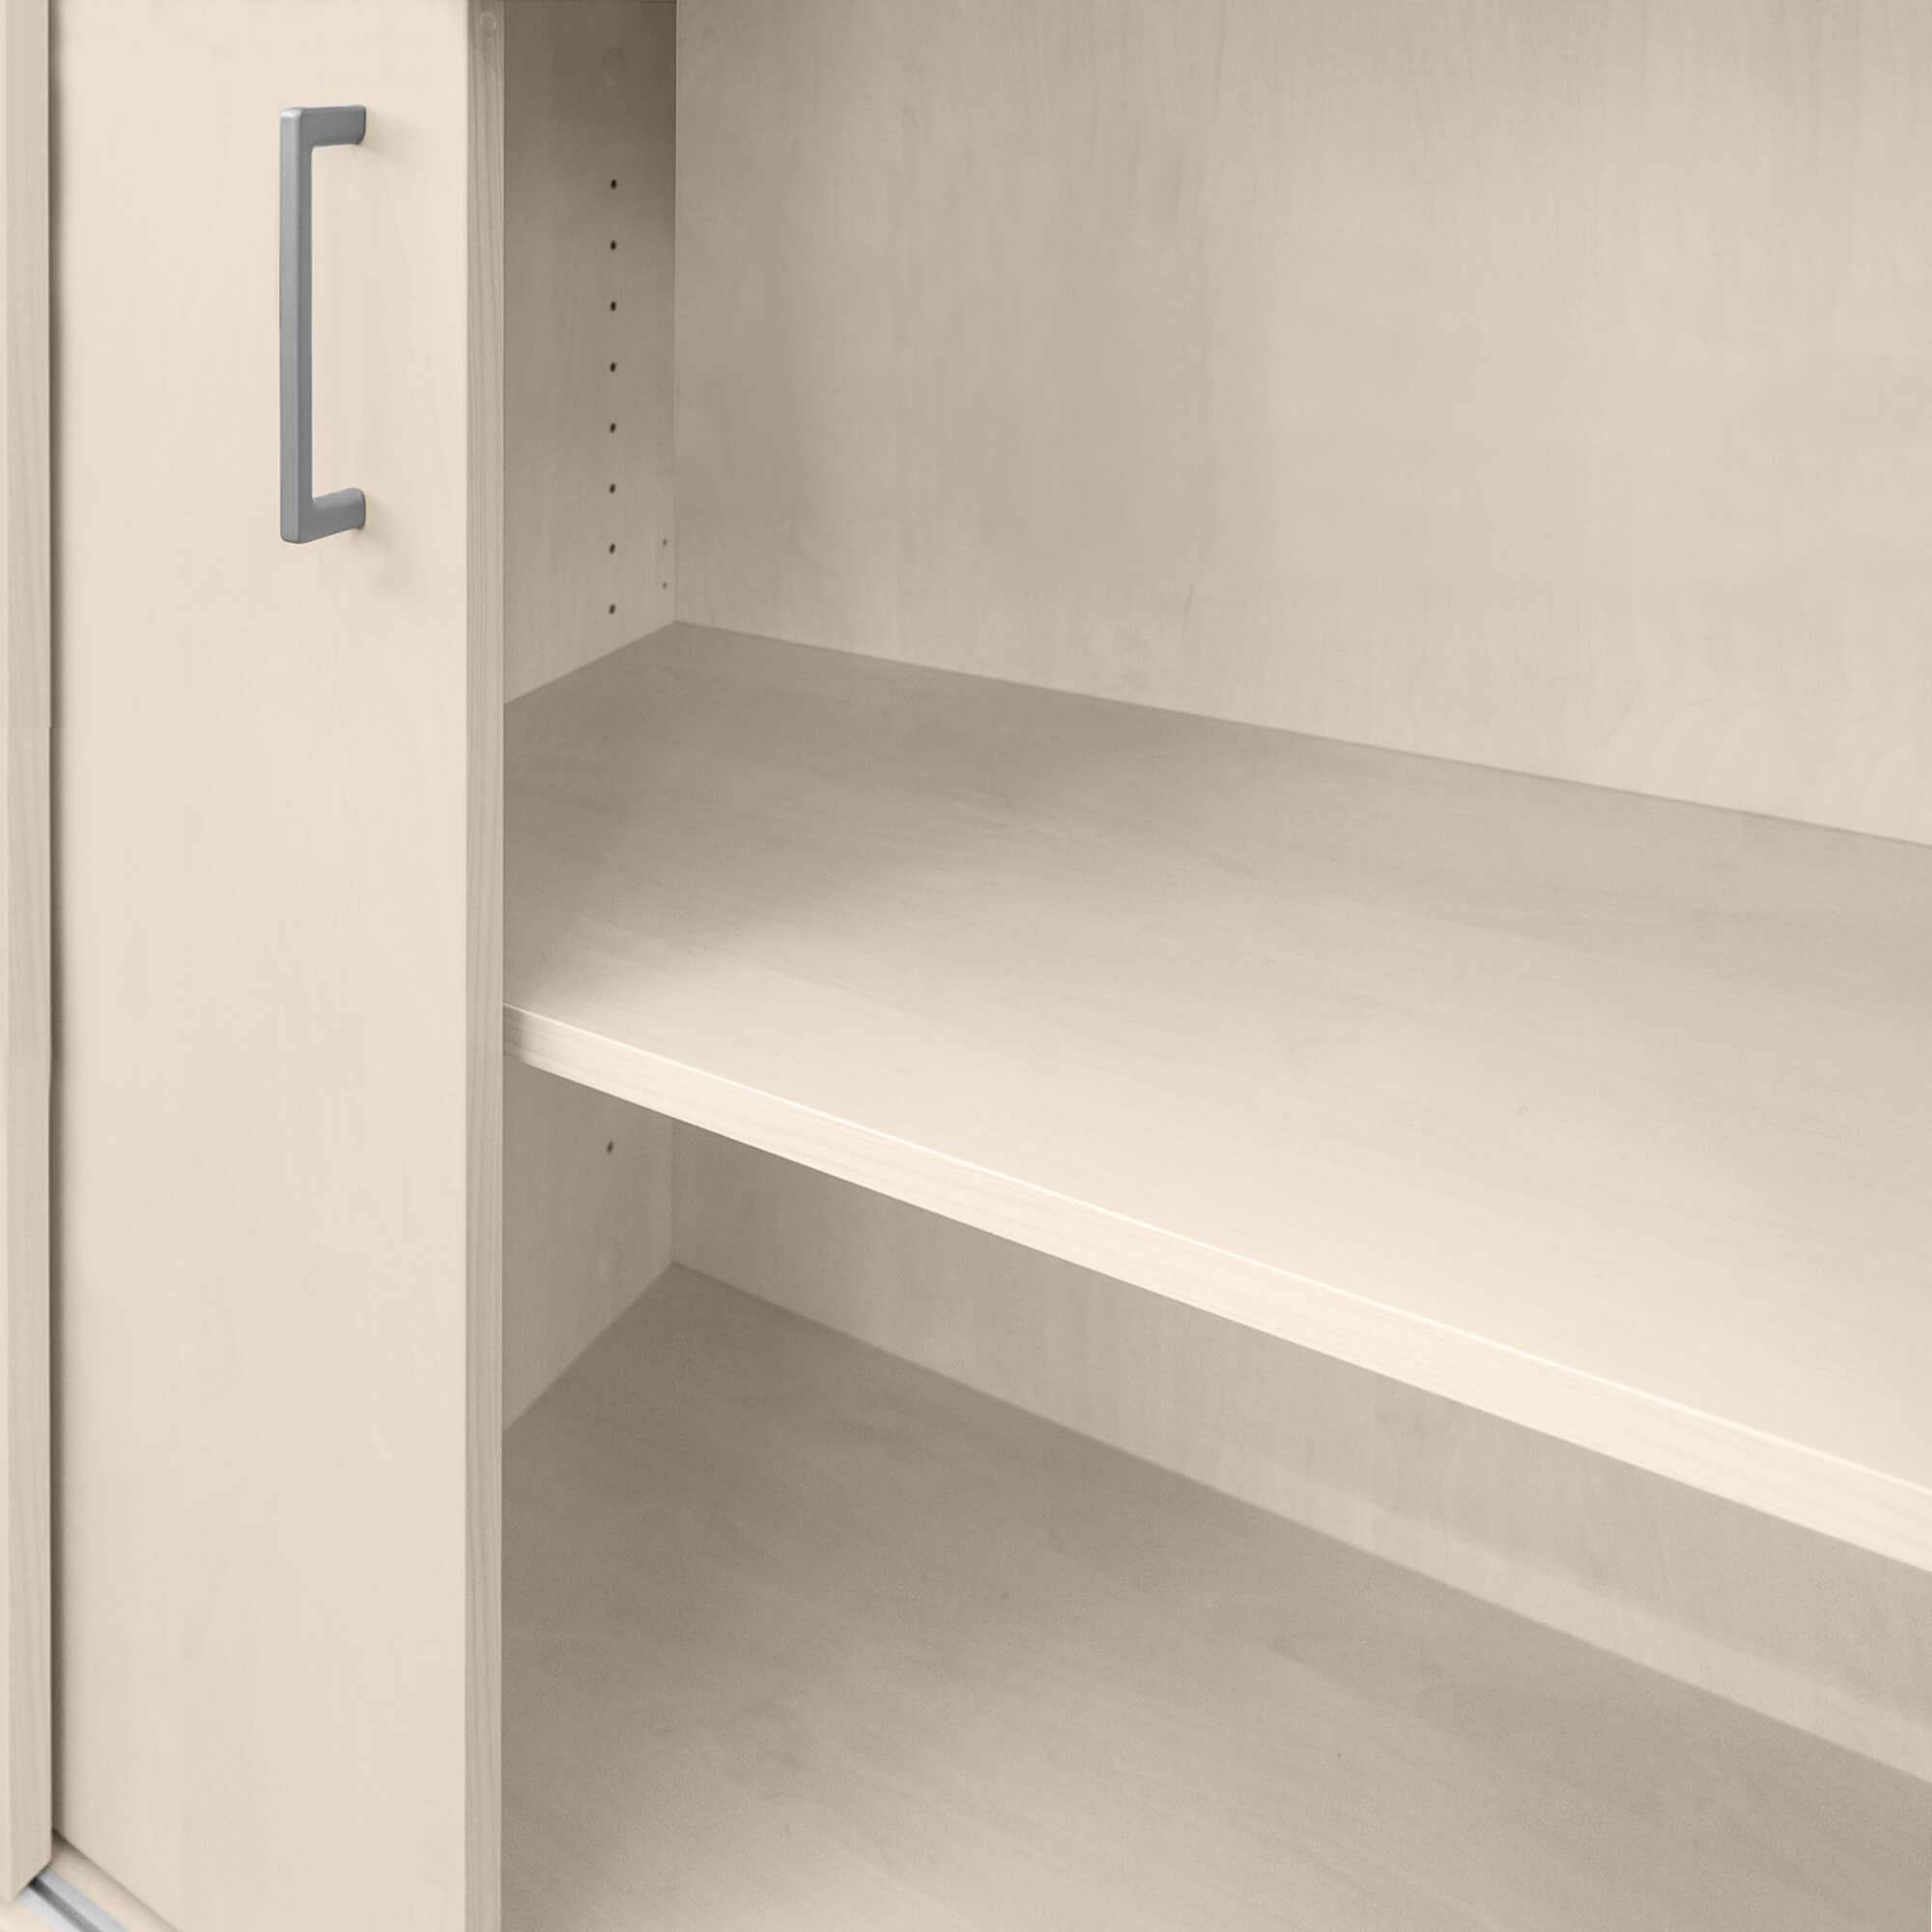 UNI PROFI Schiebetürenschrank abschließbar 1,2M - 5OH Ahorn Schrank Aktenschrank